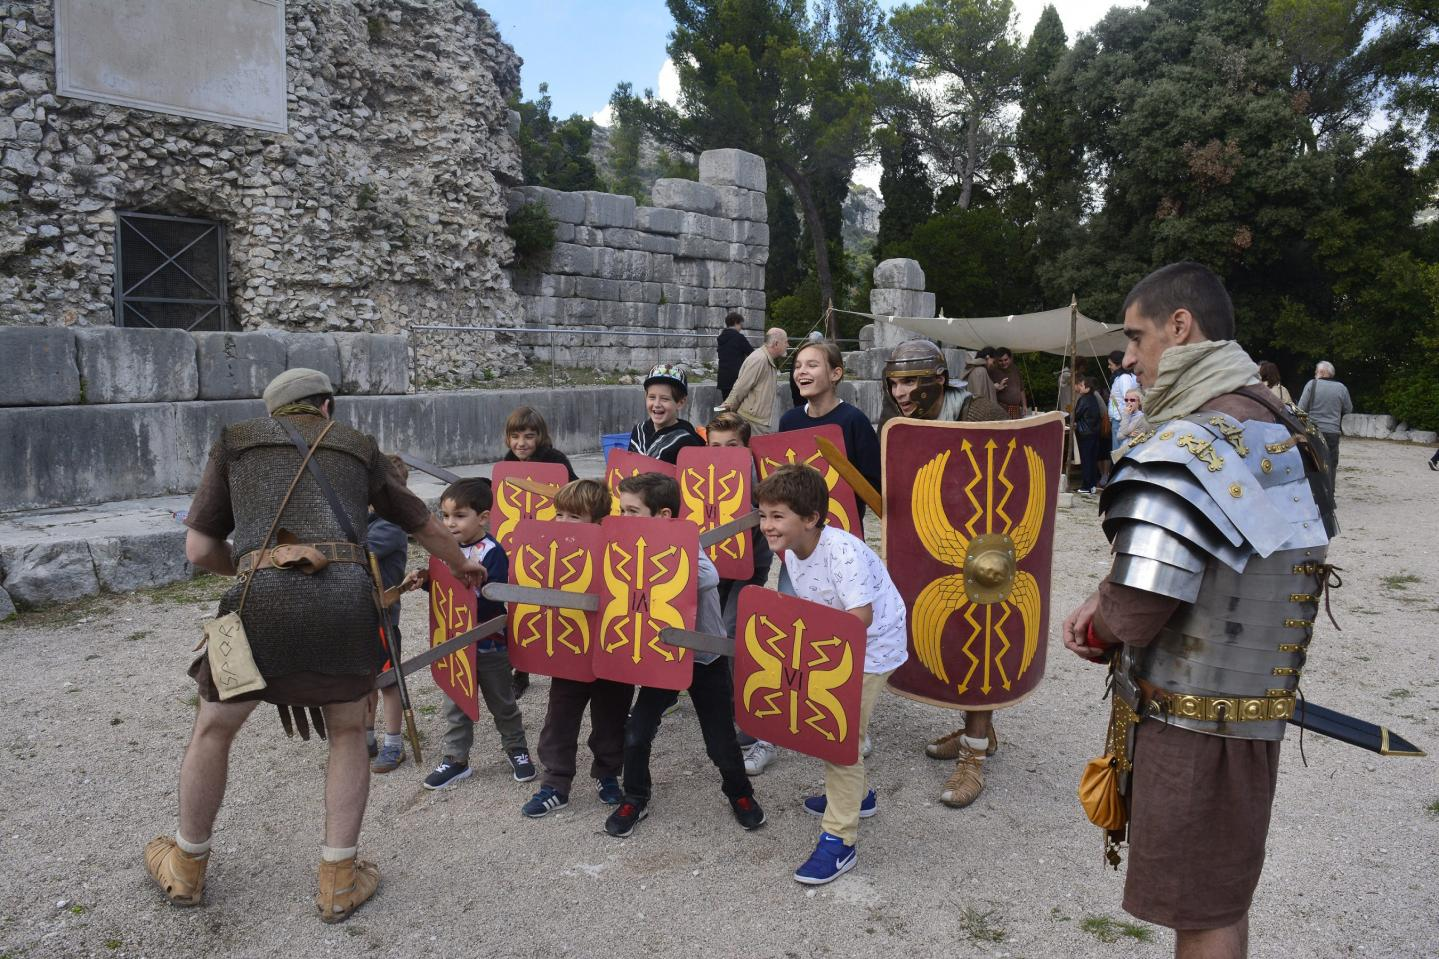 En avant petits légionnaires ! Avec les conseils de la Legio VI Fetrata.